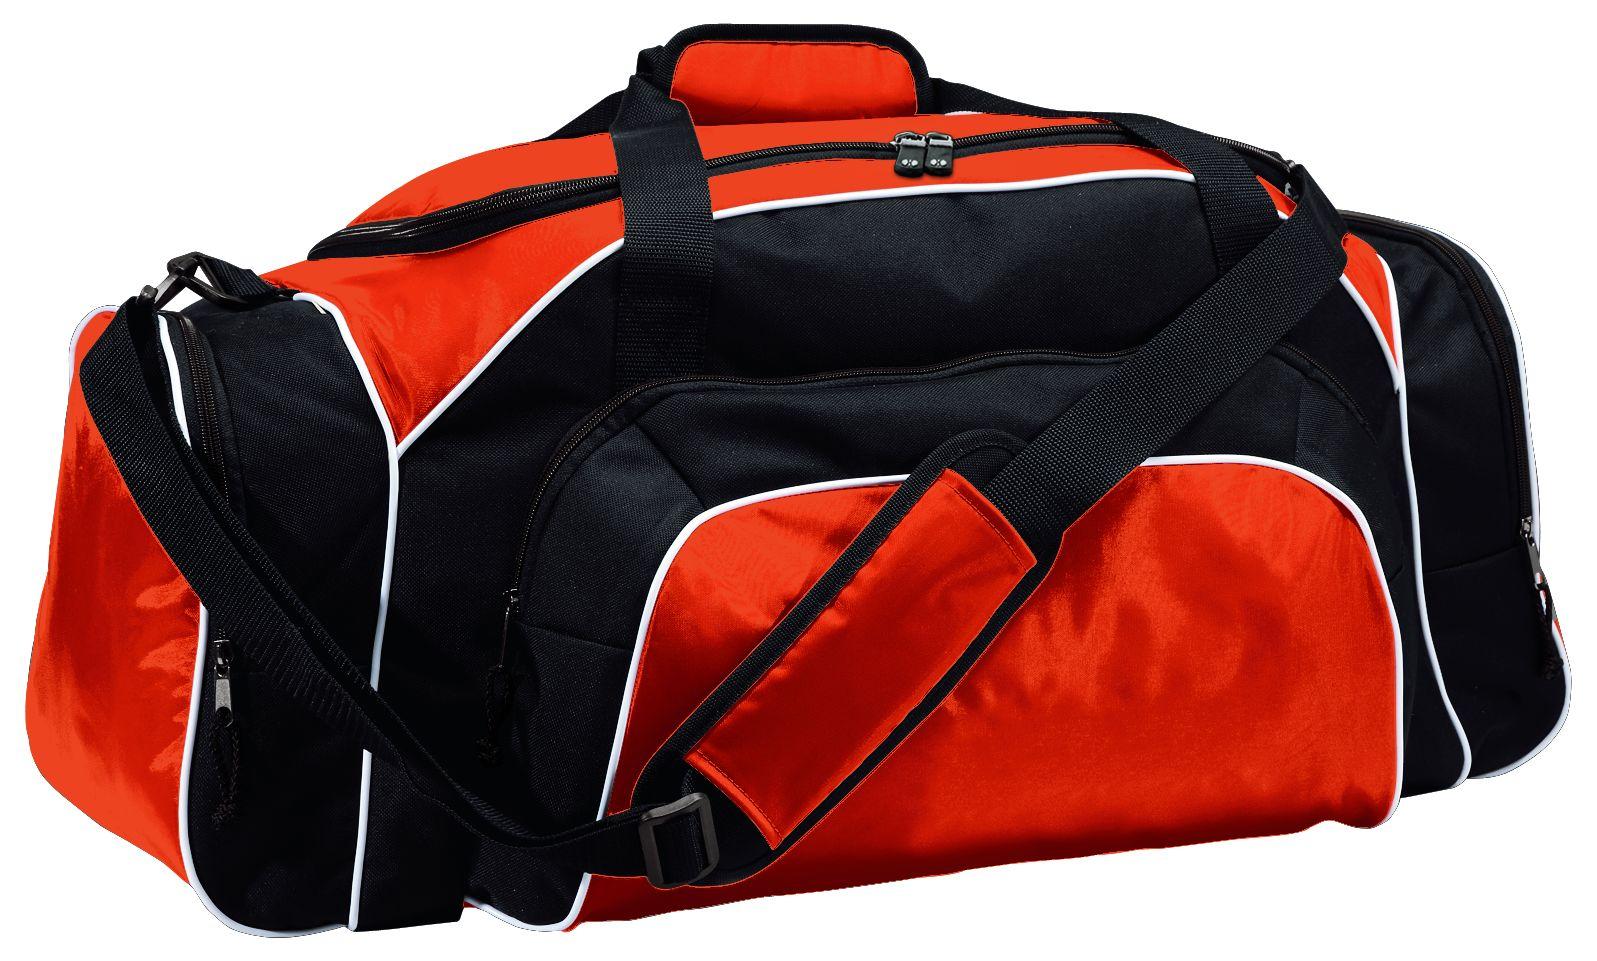 Tournament Duffel Bag - ORANGE/BLACK/WHITE